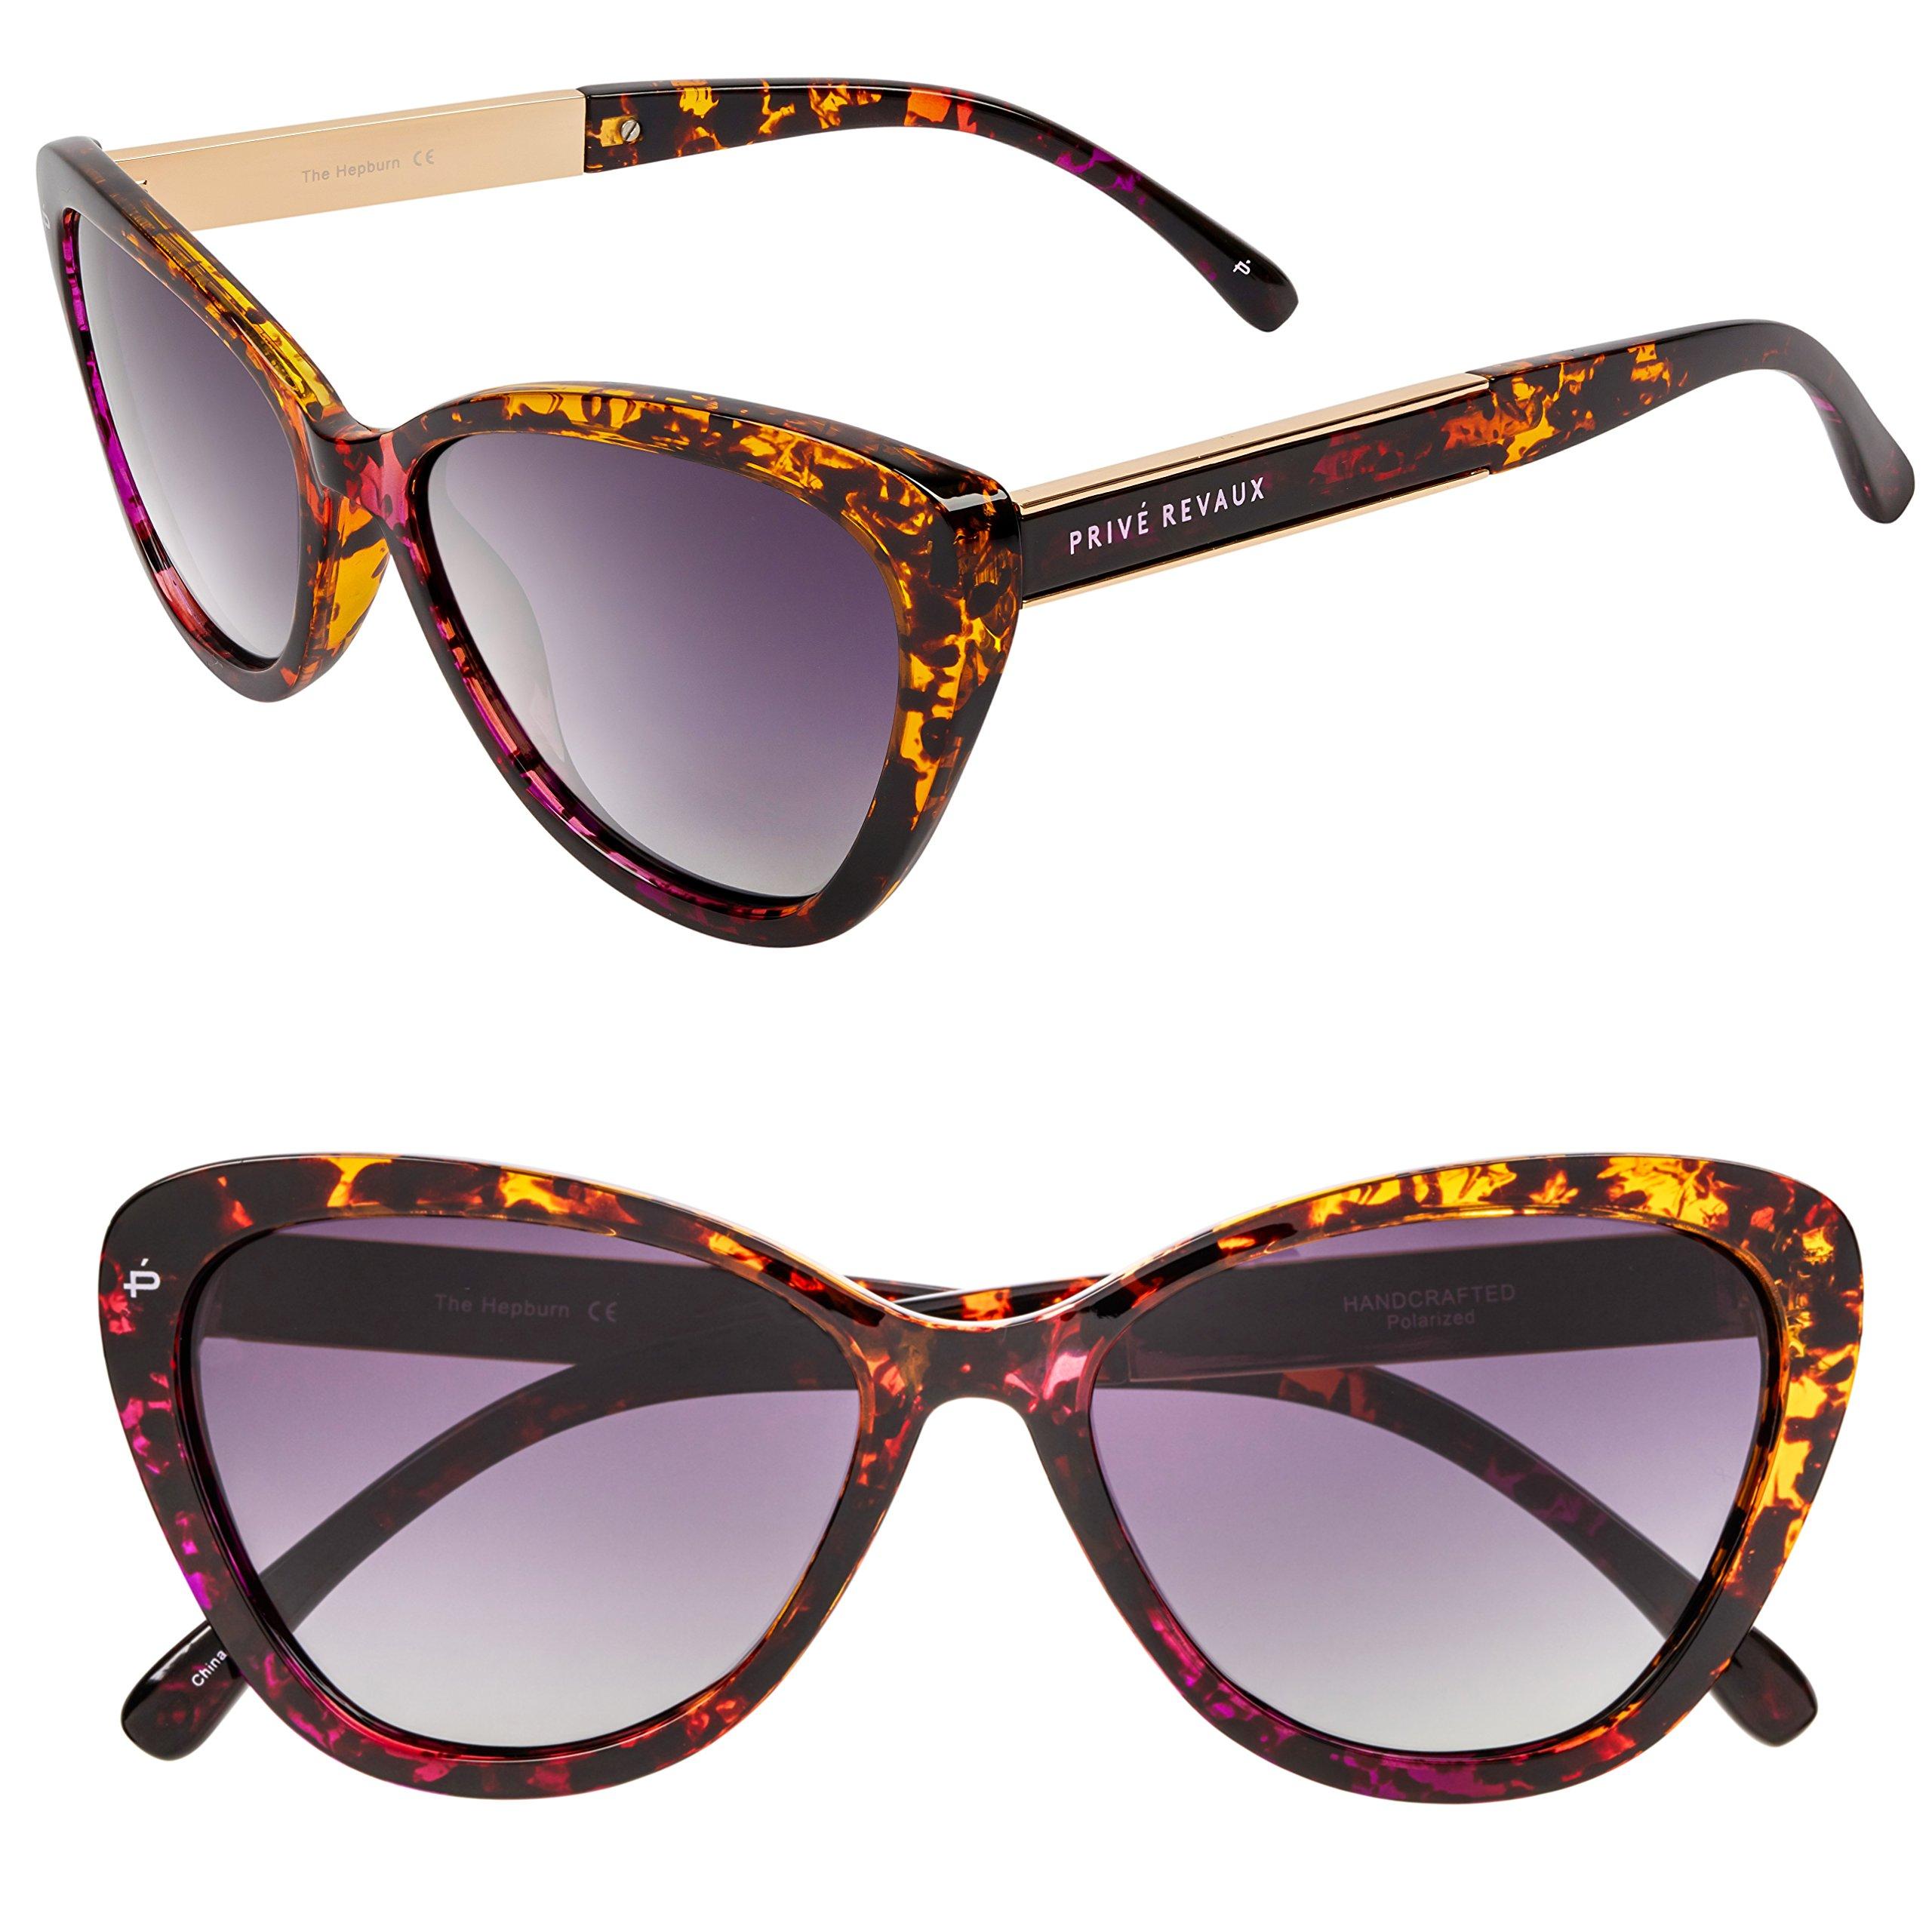 "PRIVÉ REVAUX ICON Collection ""The Hepburn"" Designer Polarized Retro Cat-Eye Sunglasses by PRIVÉ REVAUX (Image #1)"